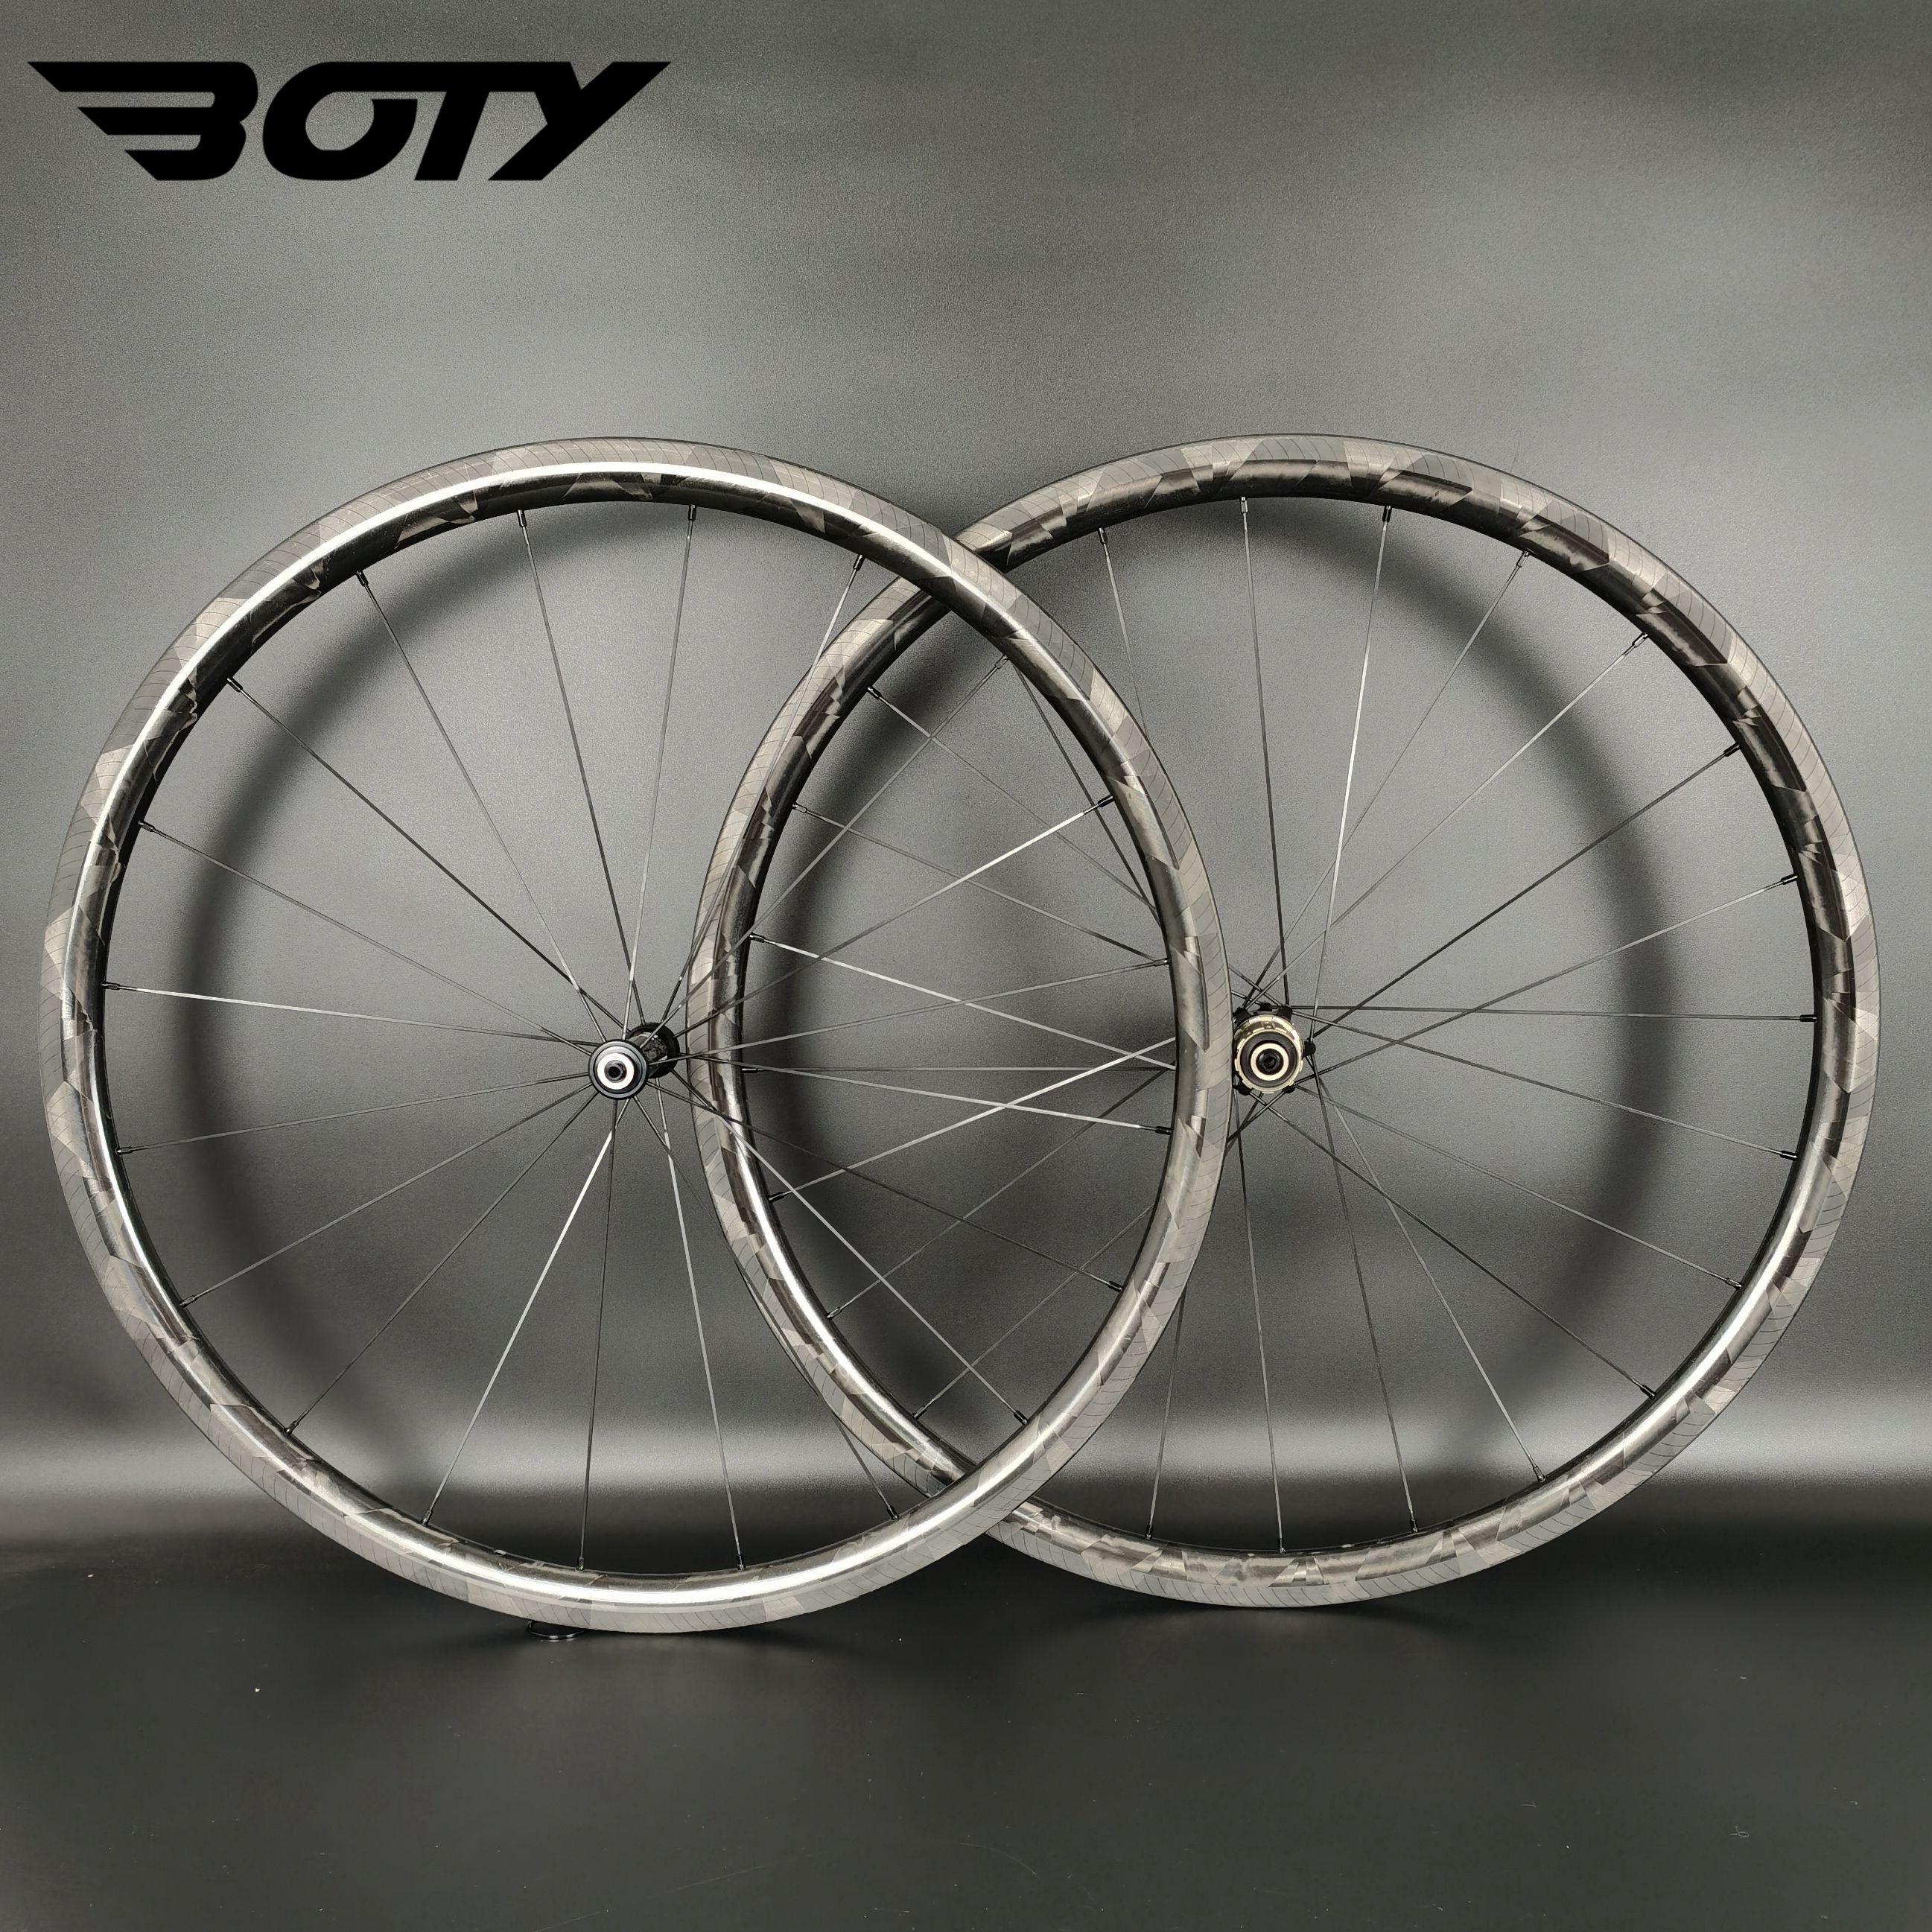 Ultralight 700C carbon wheels 30mm depth 24mm width clincher/Tubular Road bike carbon wheelset with Novatec hub 20-24 hole